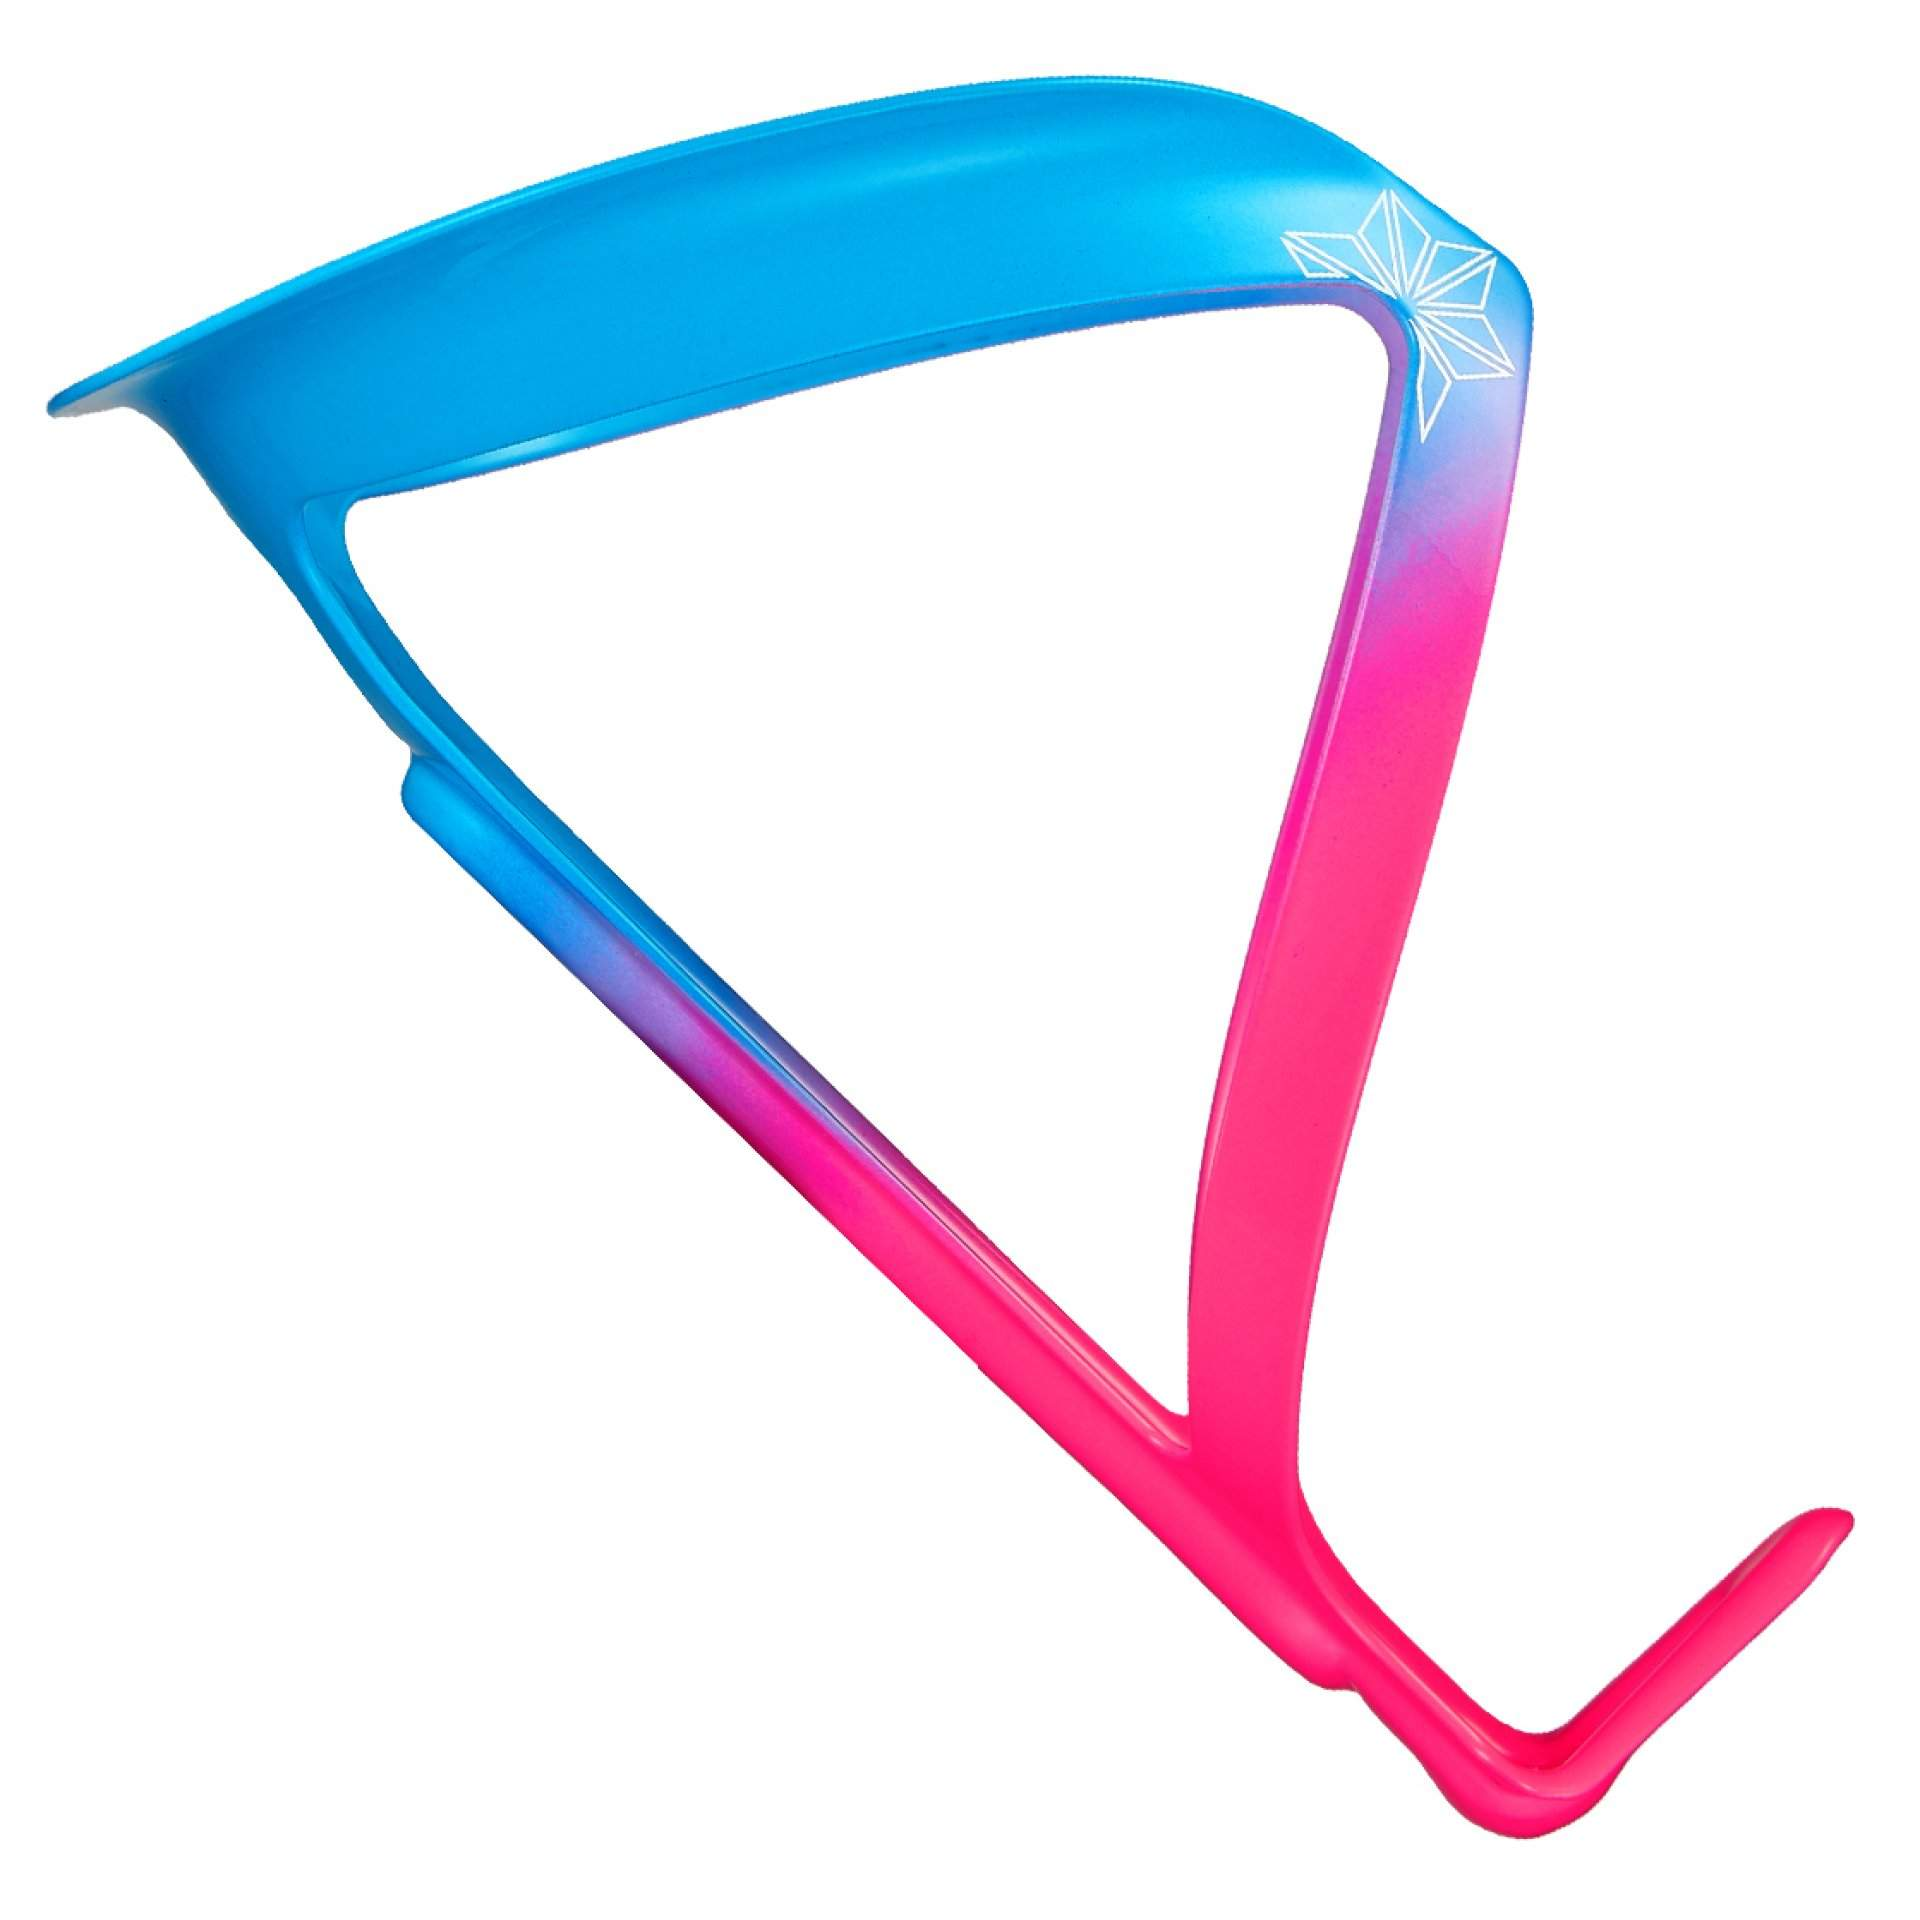 KOSZYK NA BIDON ROWEROWY SUPACAZ FLY CAGE LIMITED CG103 NEON PINK|NEON BLUE